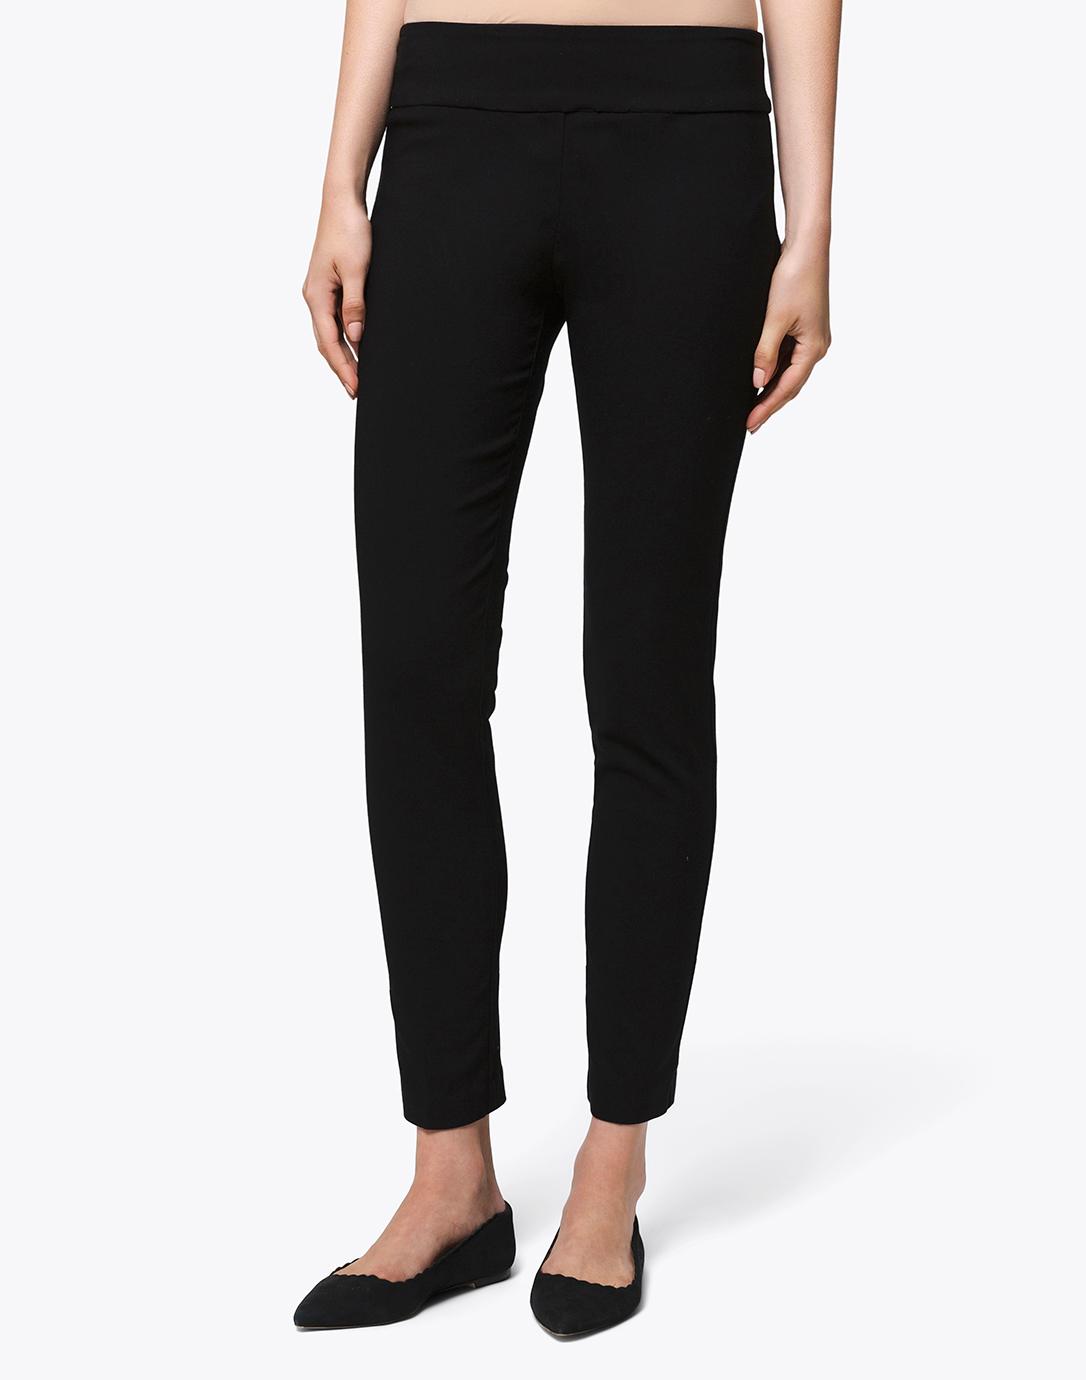 Elliott Lauren Black Stretch Pull-On Crop Pants